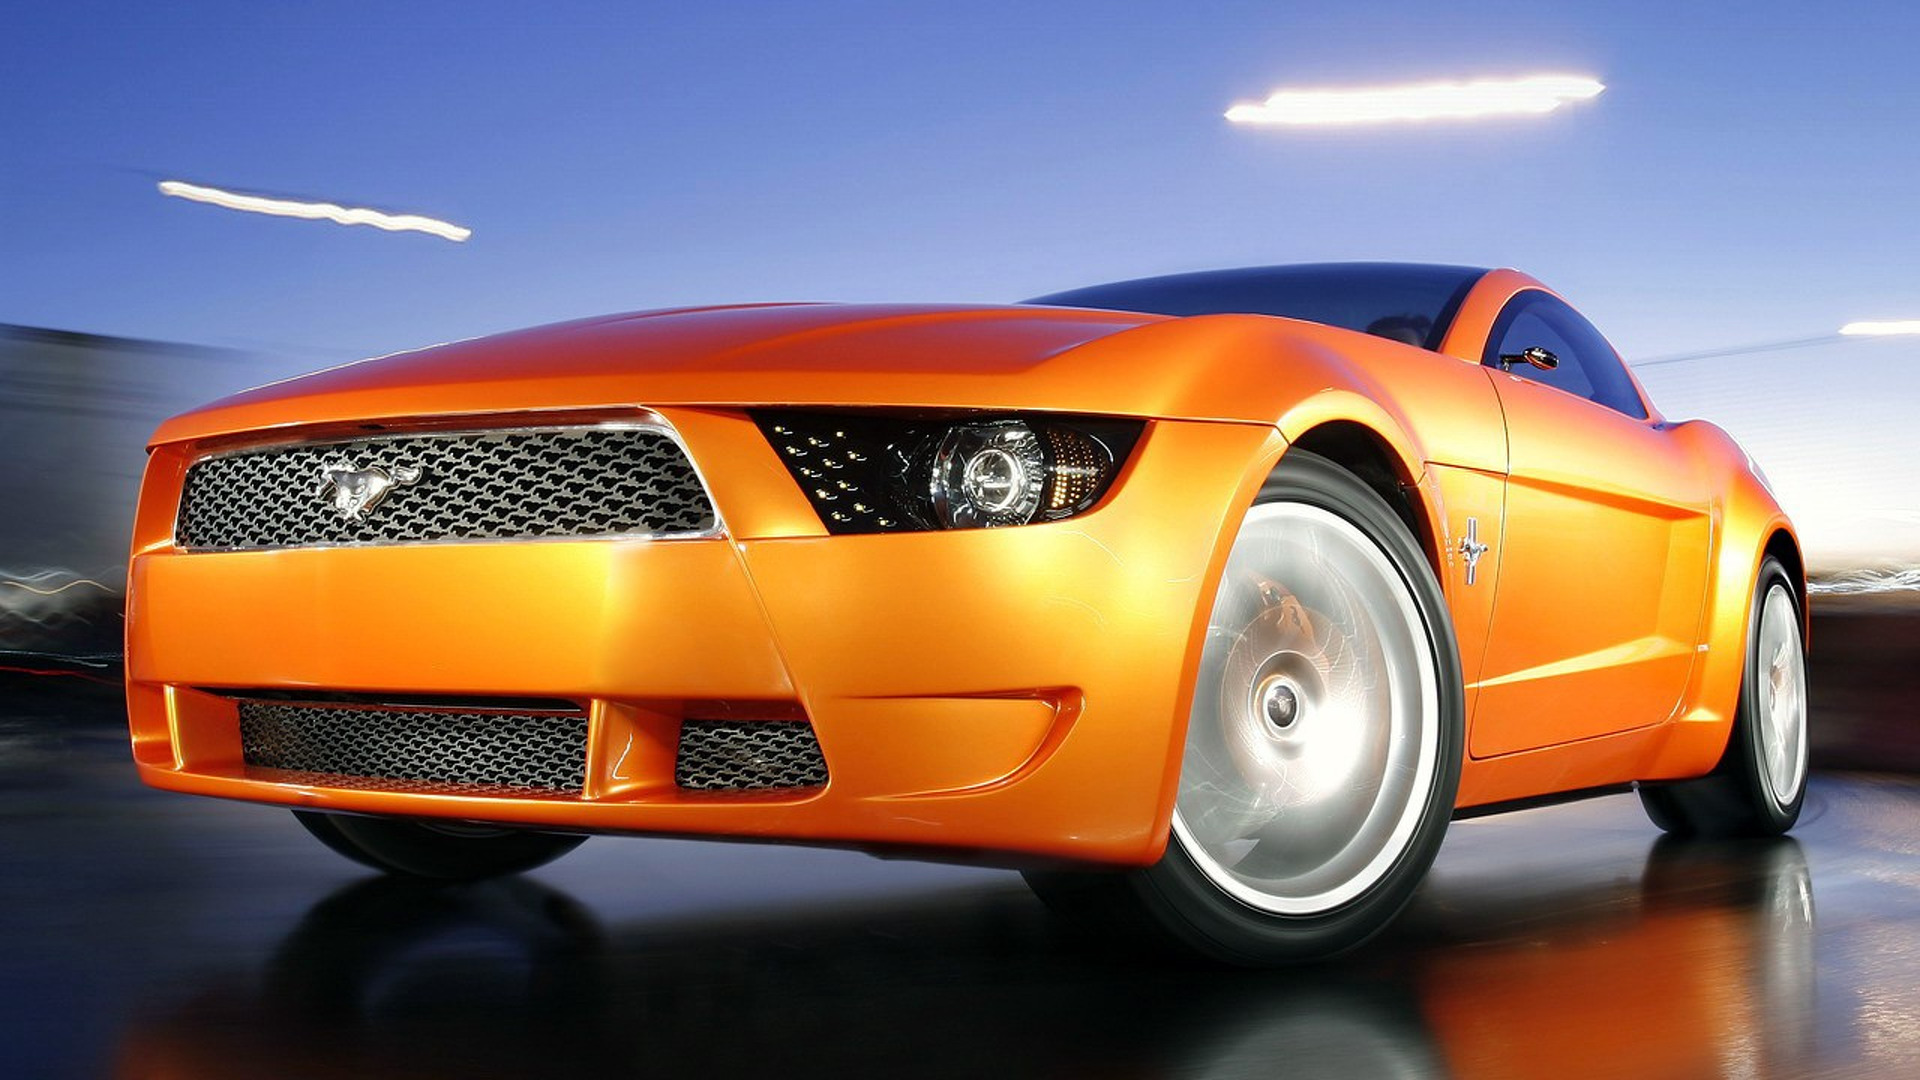 2006-ford-mustang-giugiaro-concept (8)